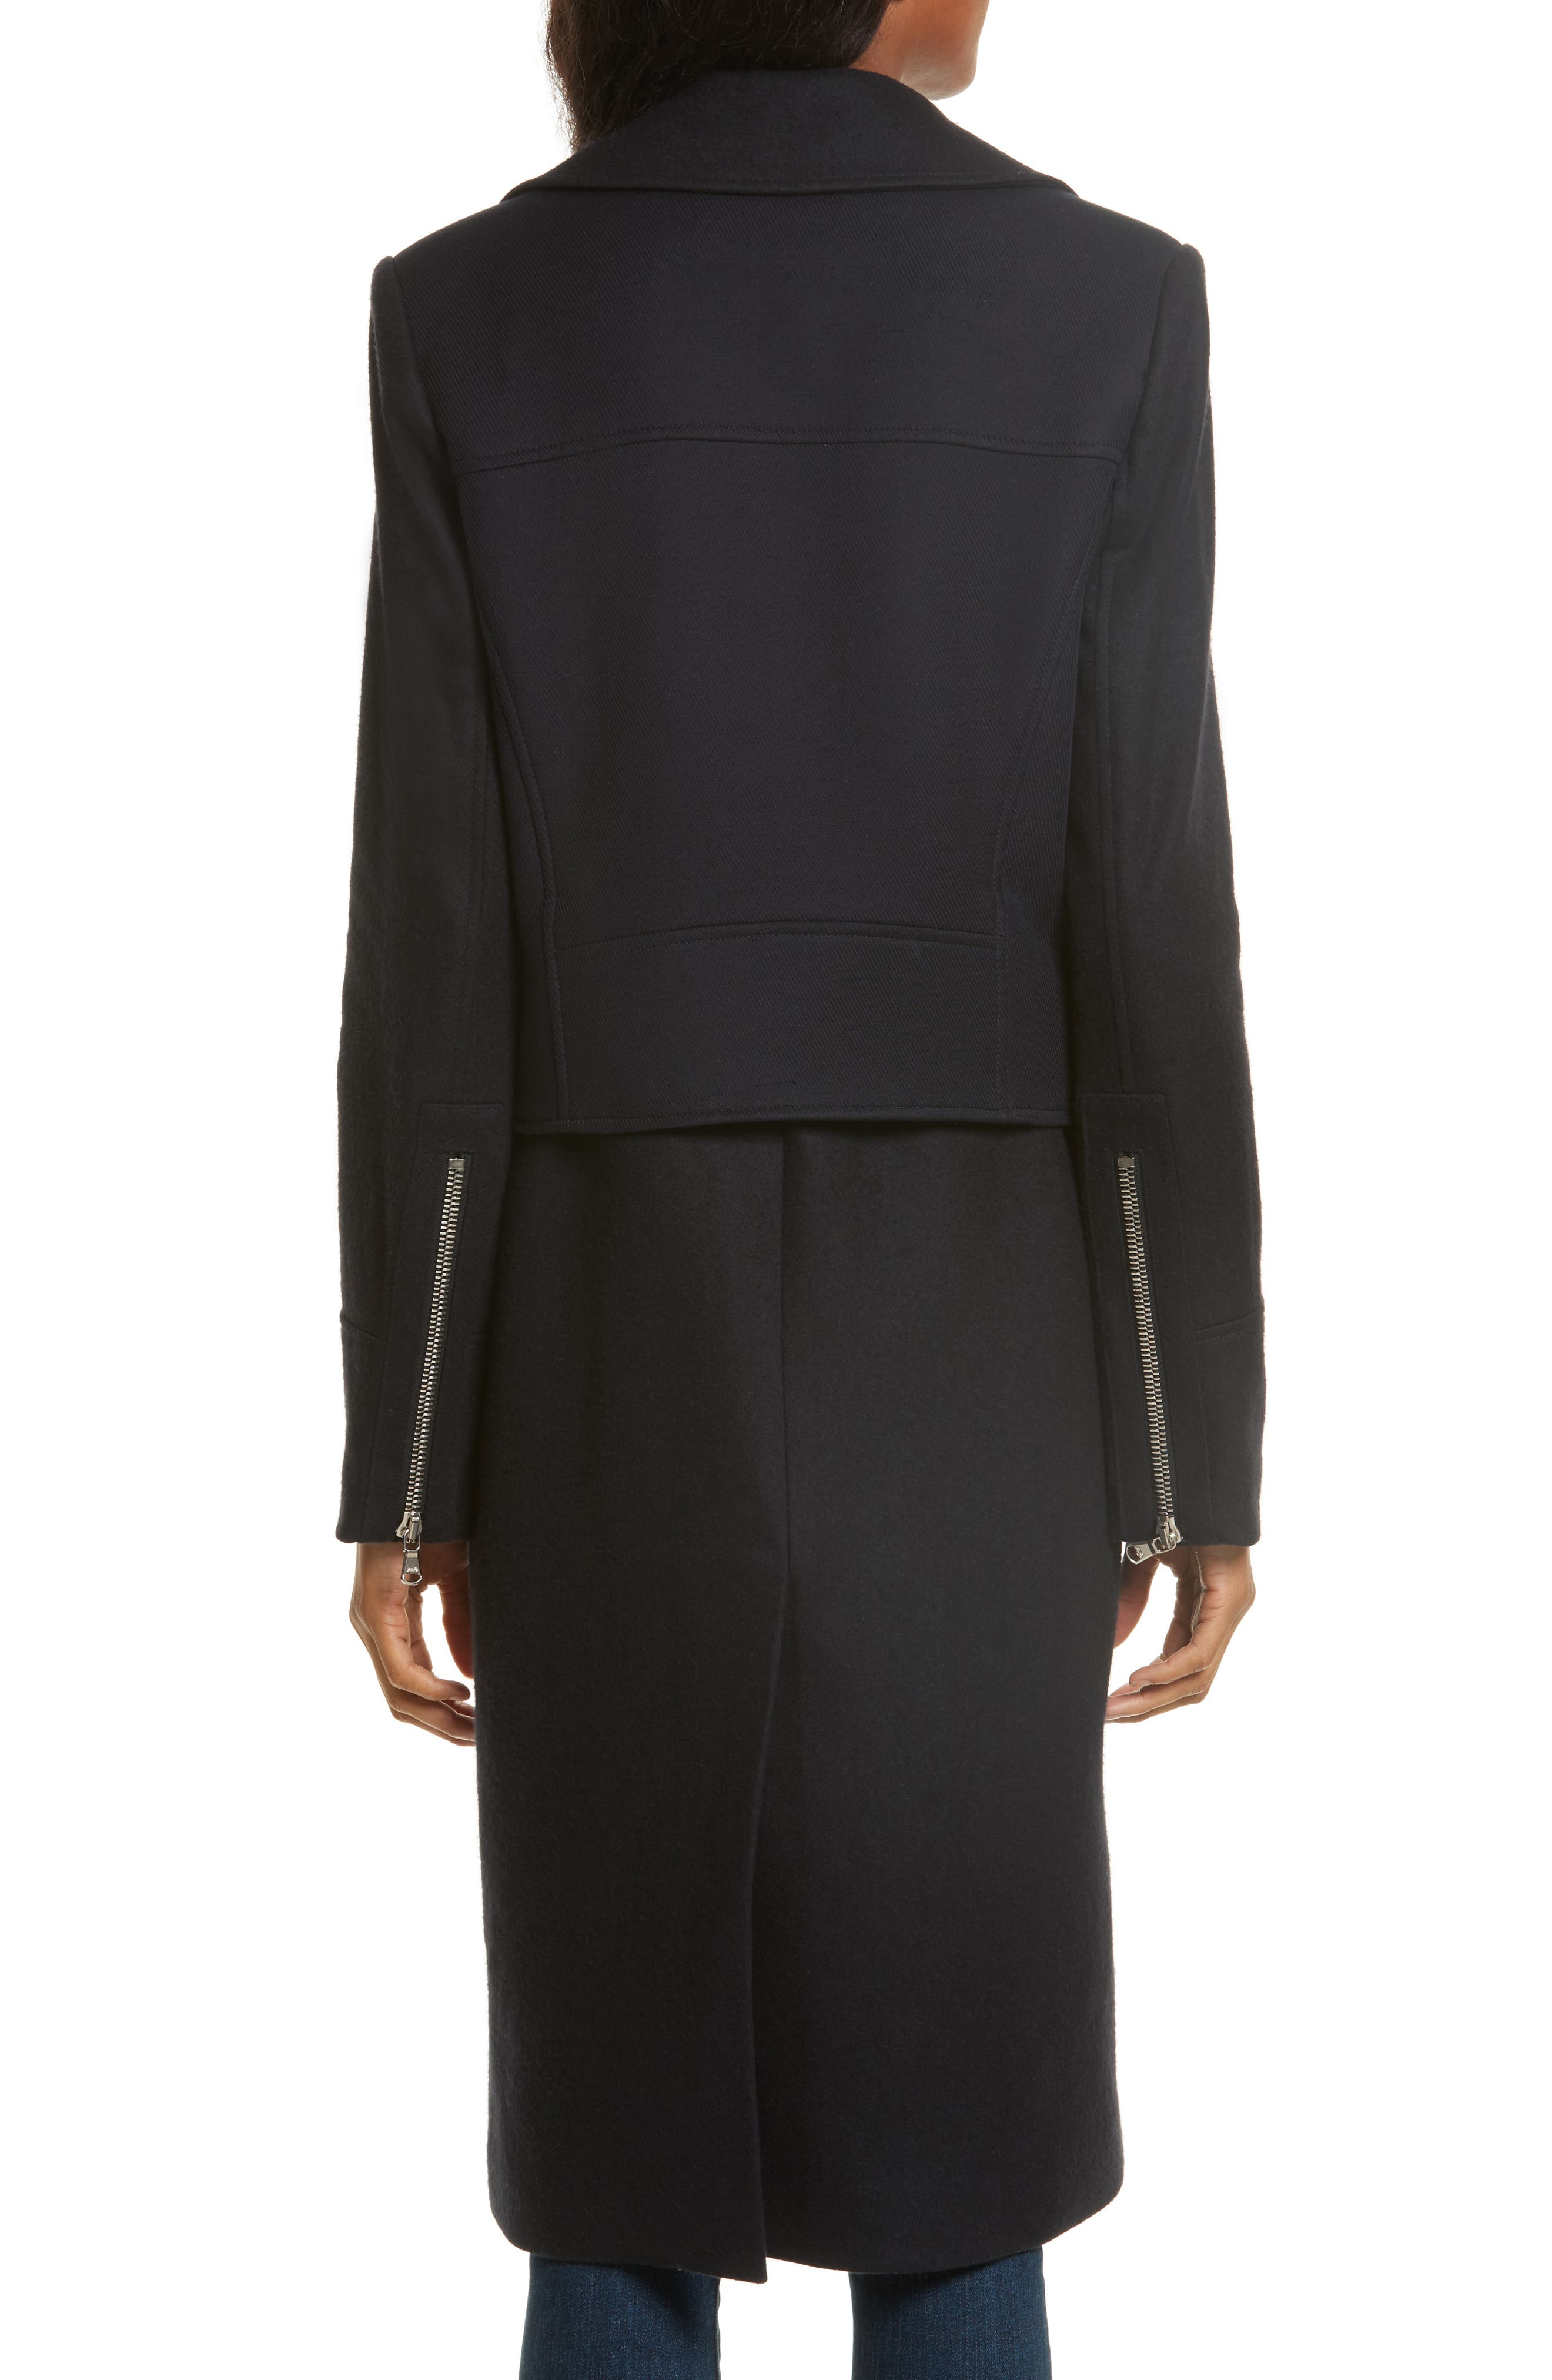 Alternate Image 3  - Veronica Beard Alcott Wool & Cashmere Blend Vest Coat